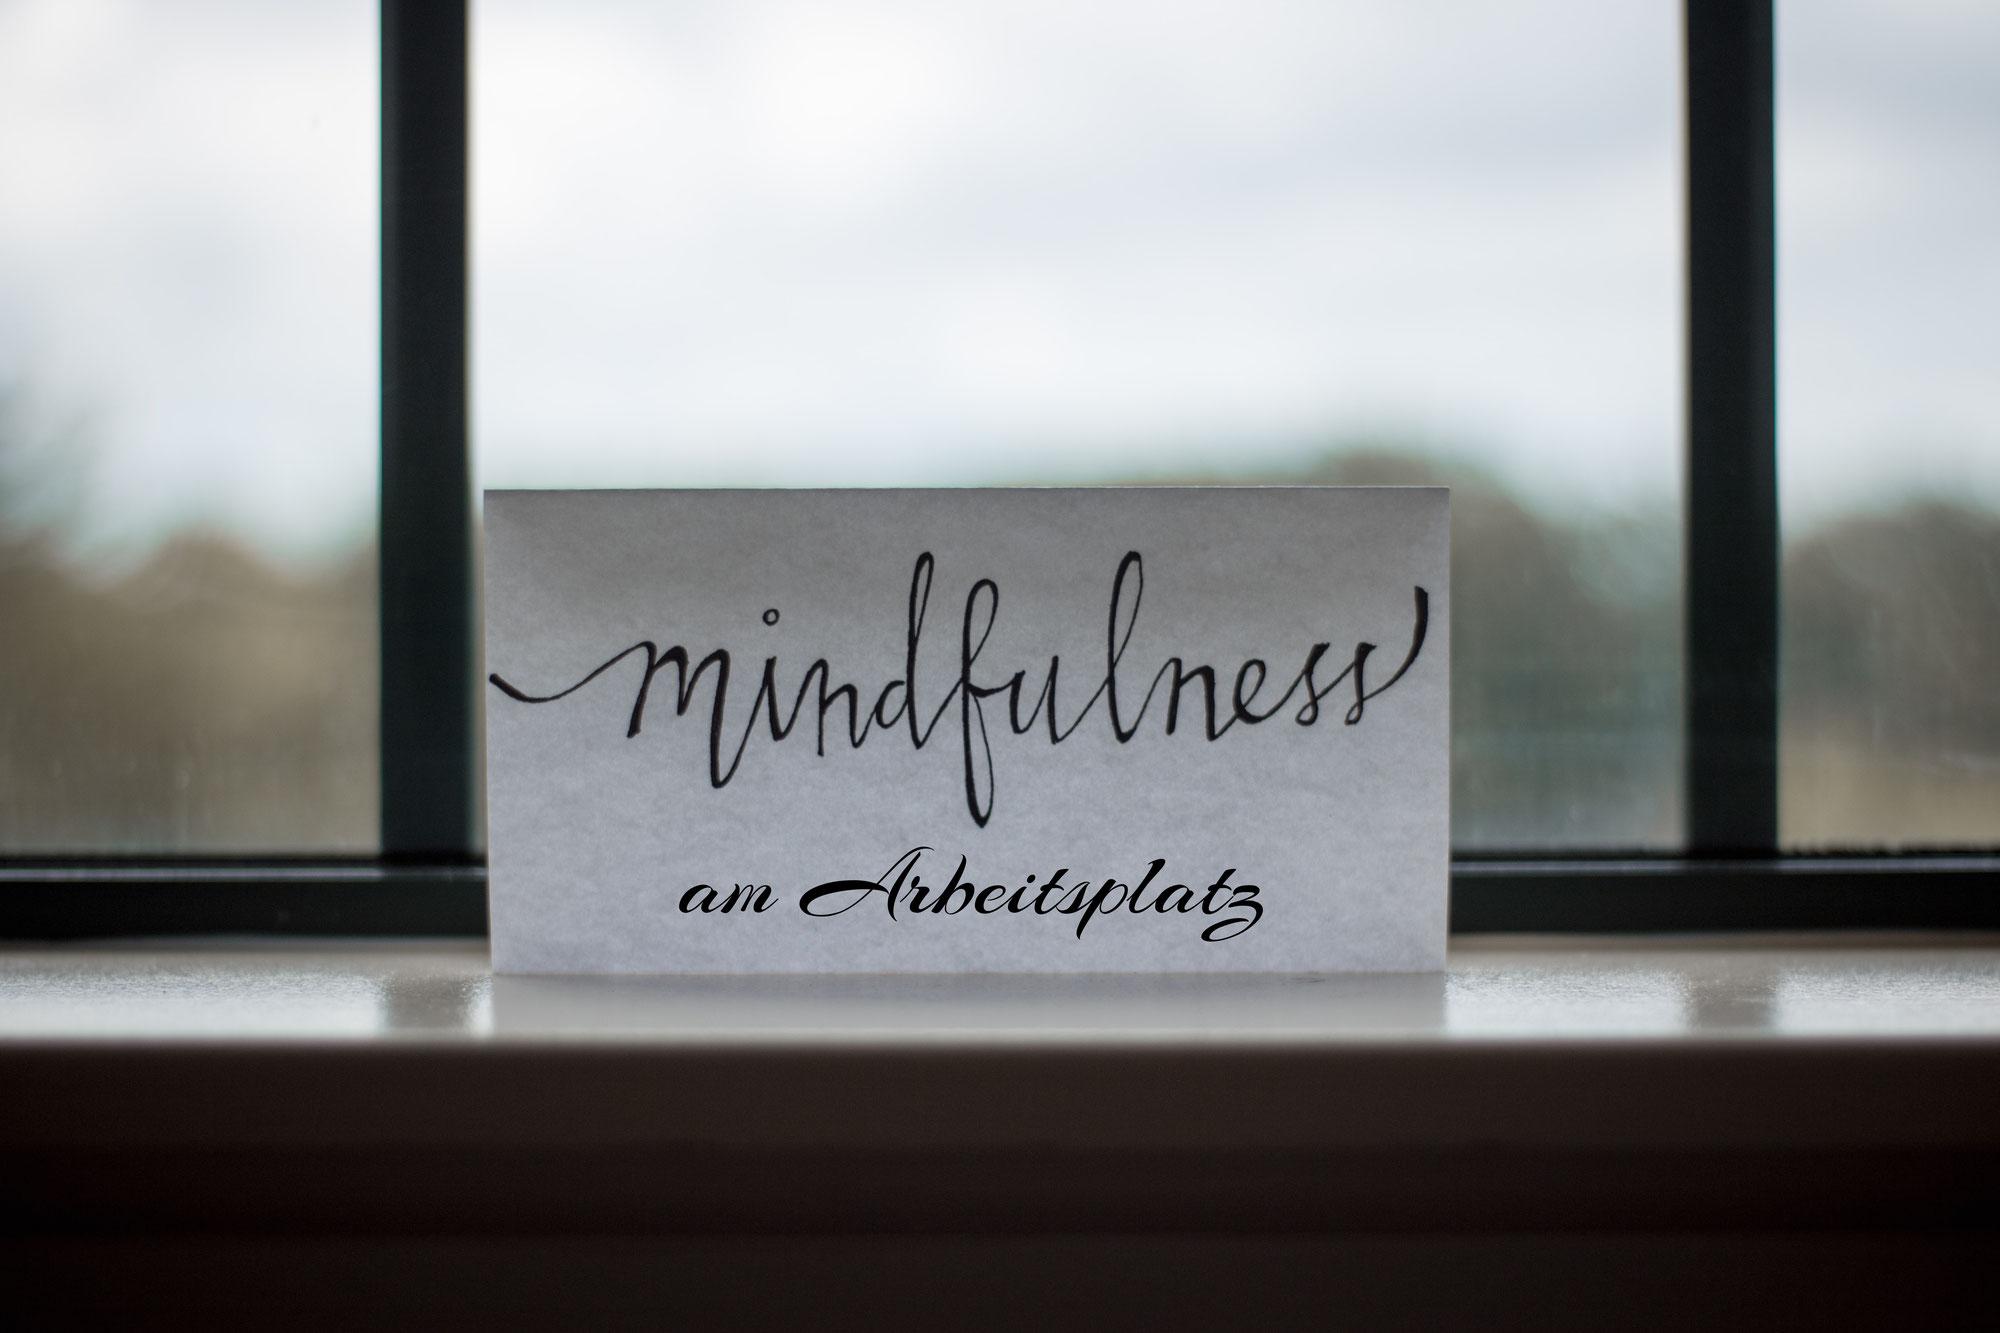 Mindfulness im Arbeitsalltag